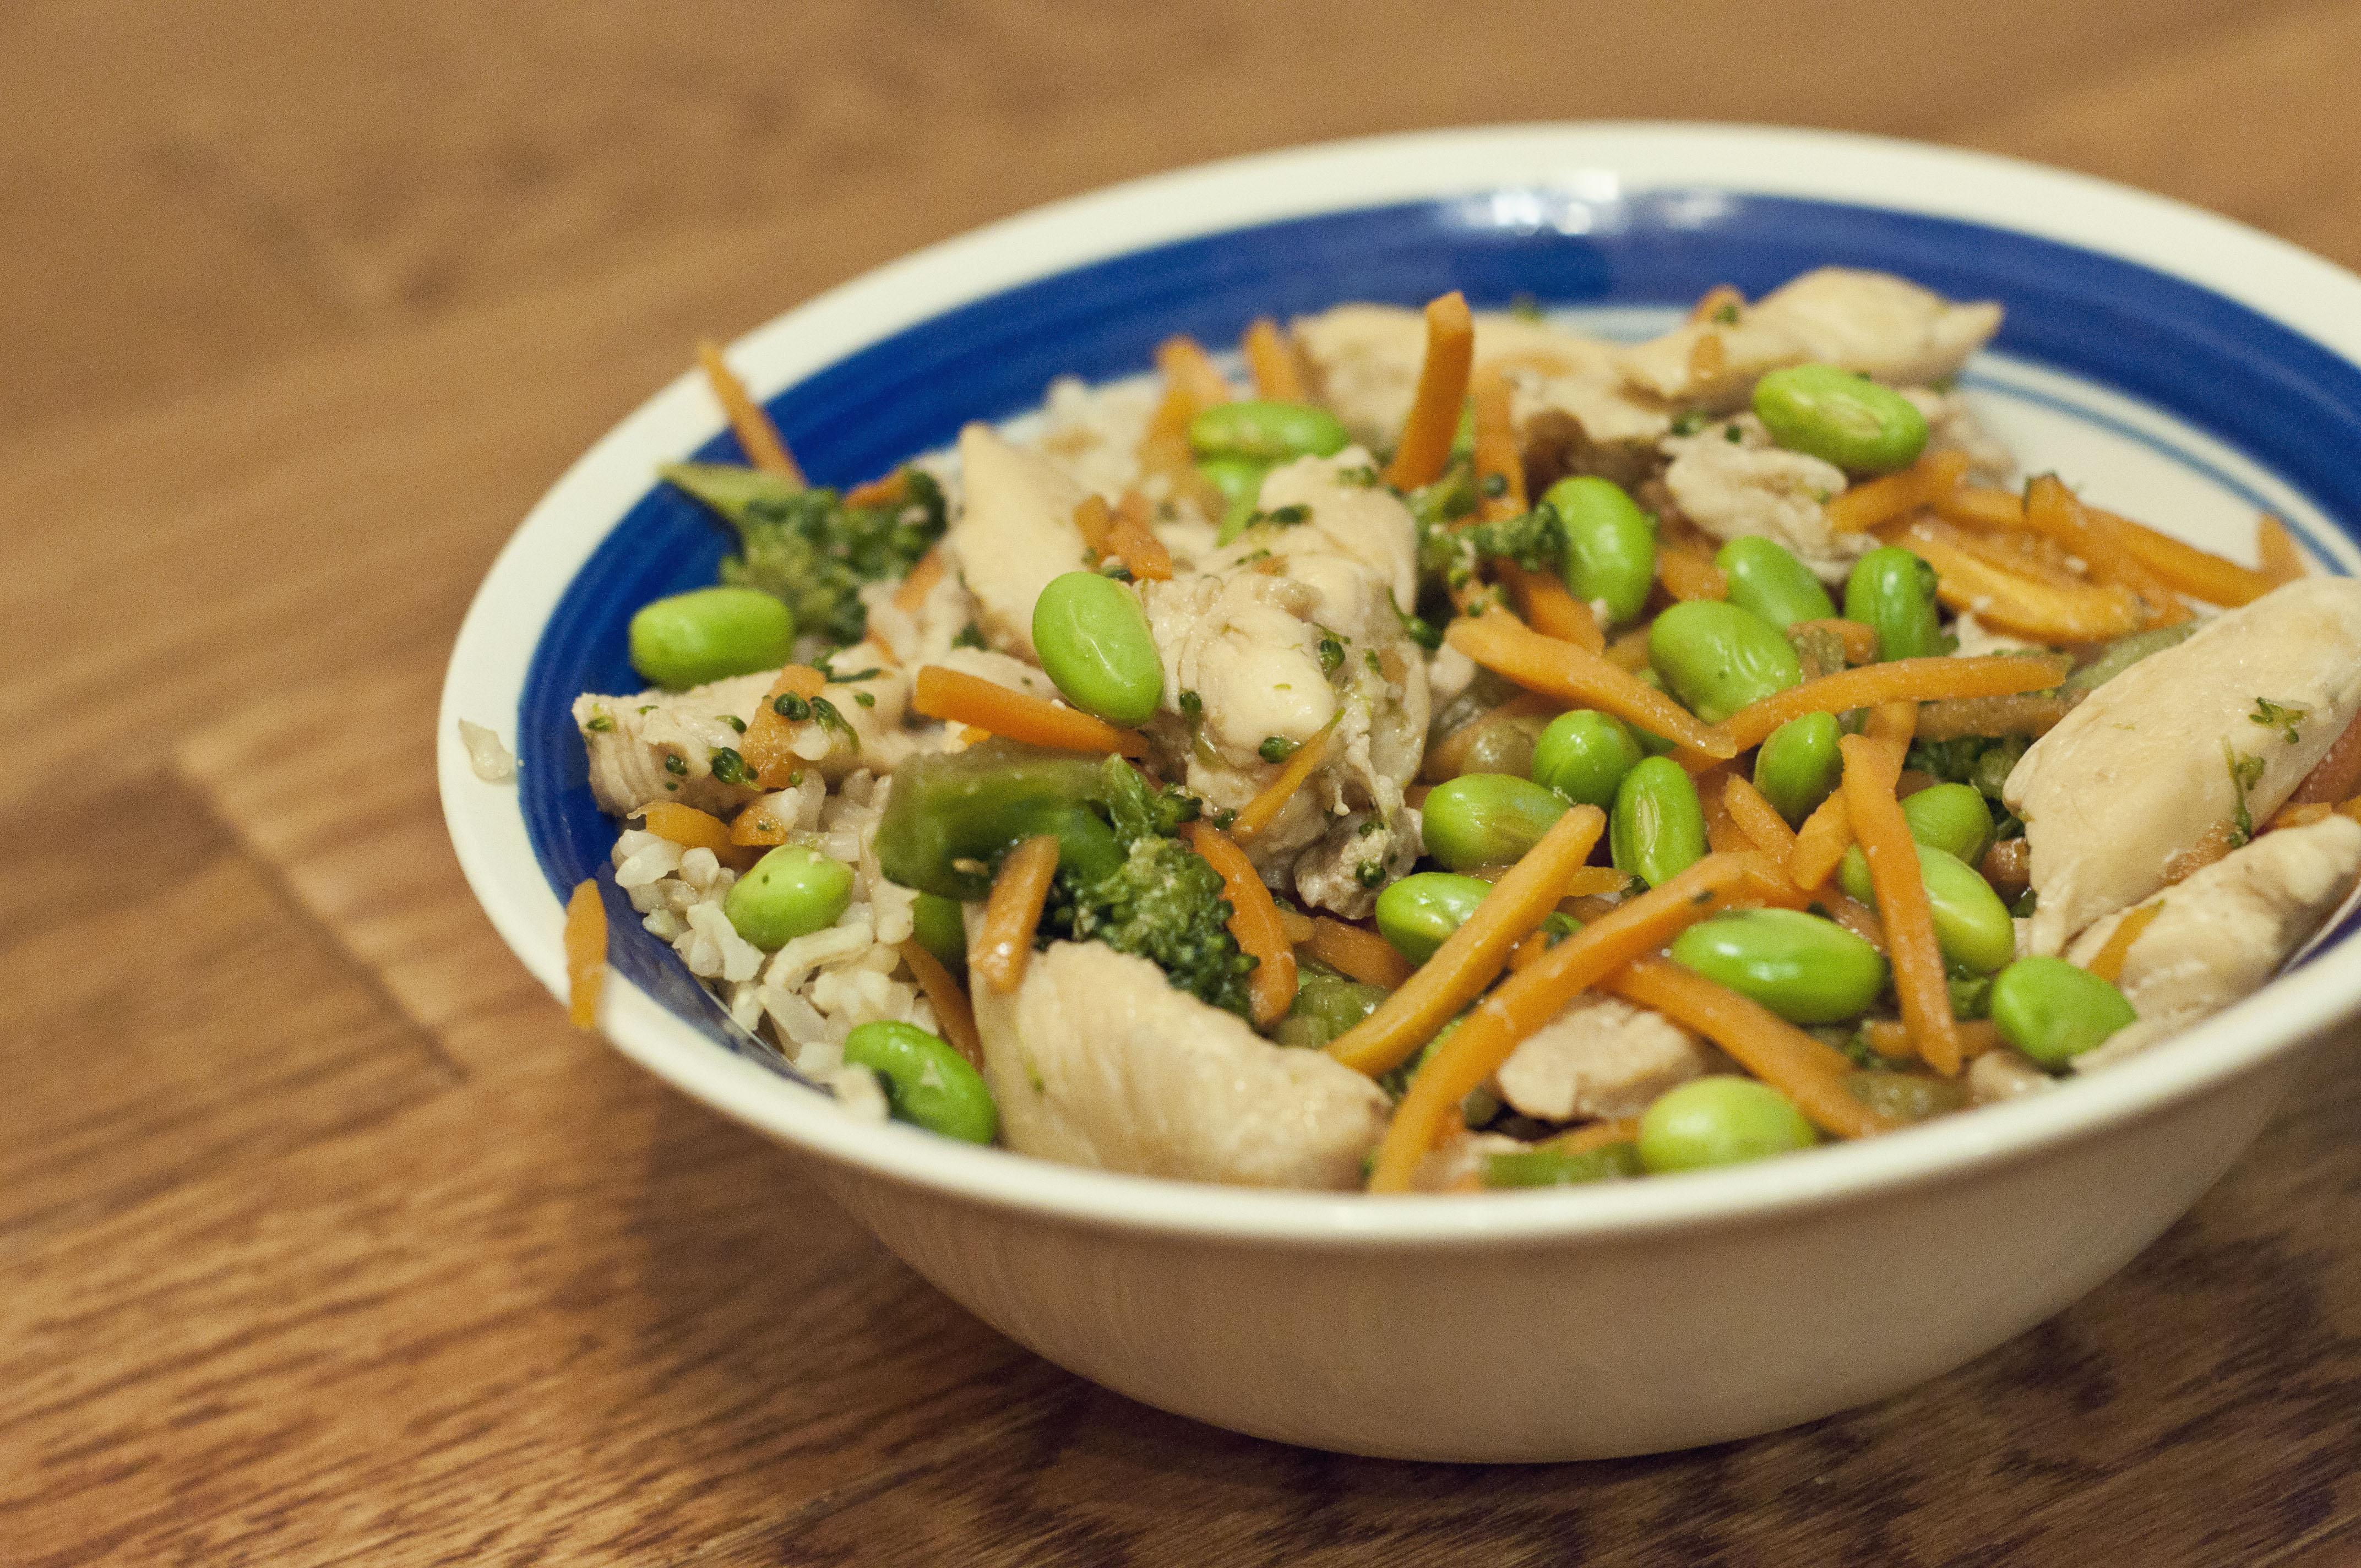 chicken, chicken recipe, teriyaki recipe, recipe, cooking, food, taste arkansas, arkansas rice, agriculture, dinner, easy recipe, easy chicken teriyaki rice bowl recipe, edamame,